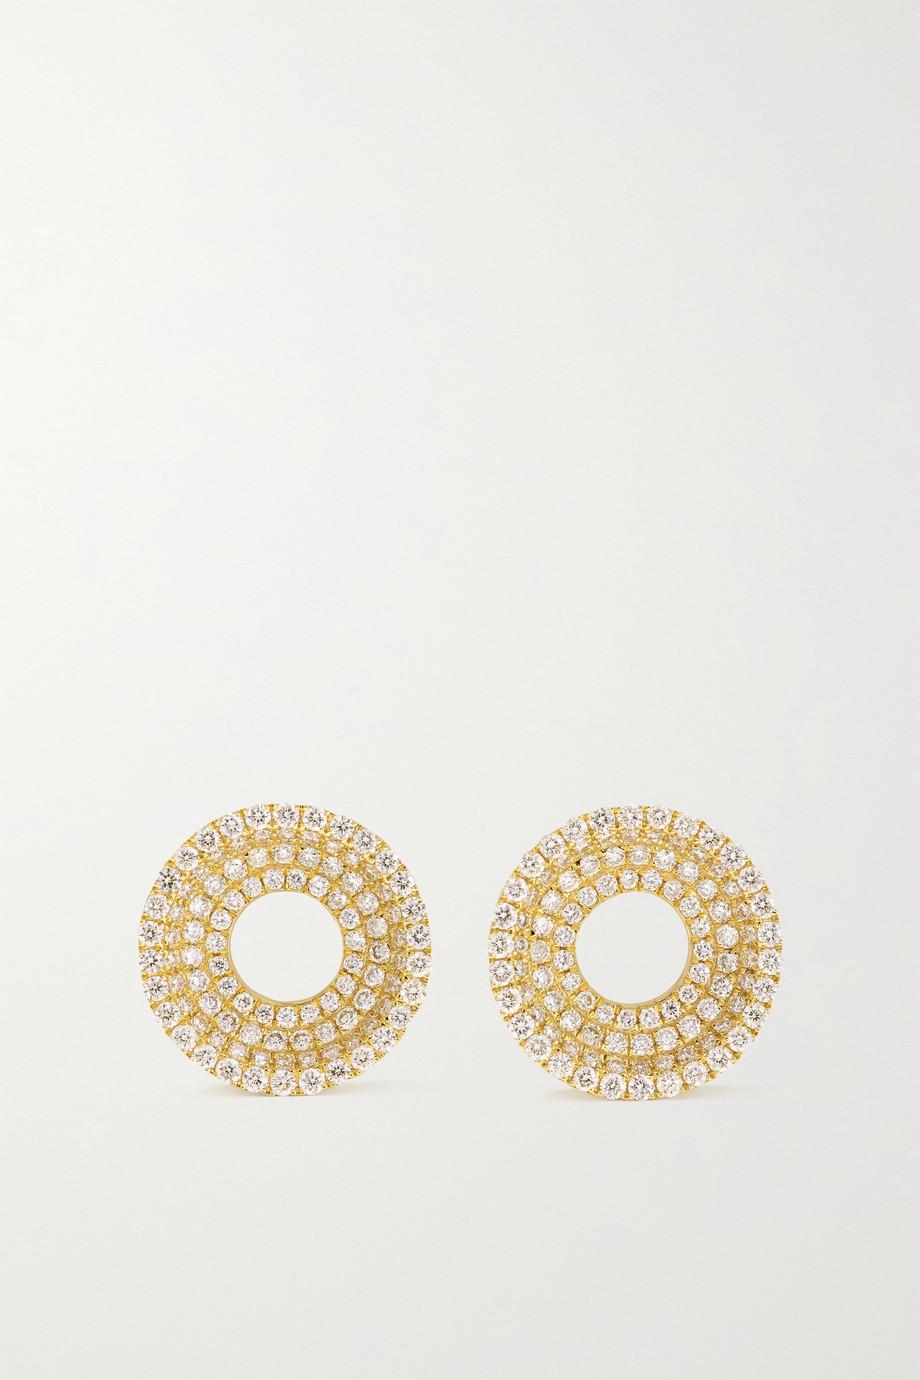 State Property Drew 18-karat gold diamond earrings